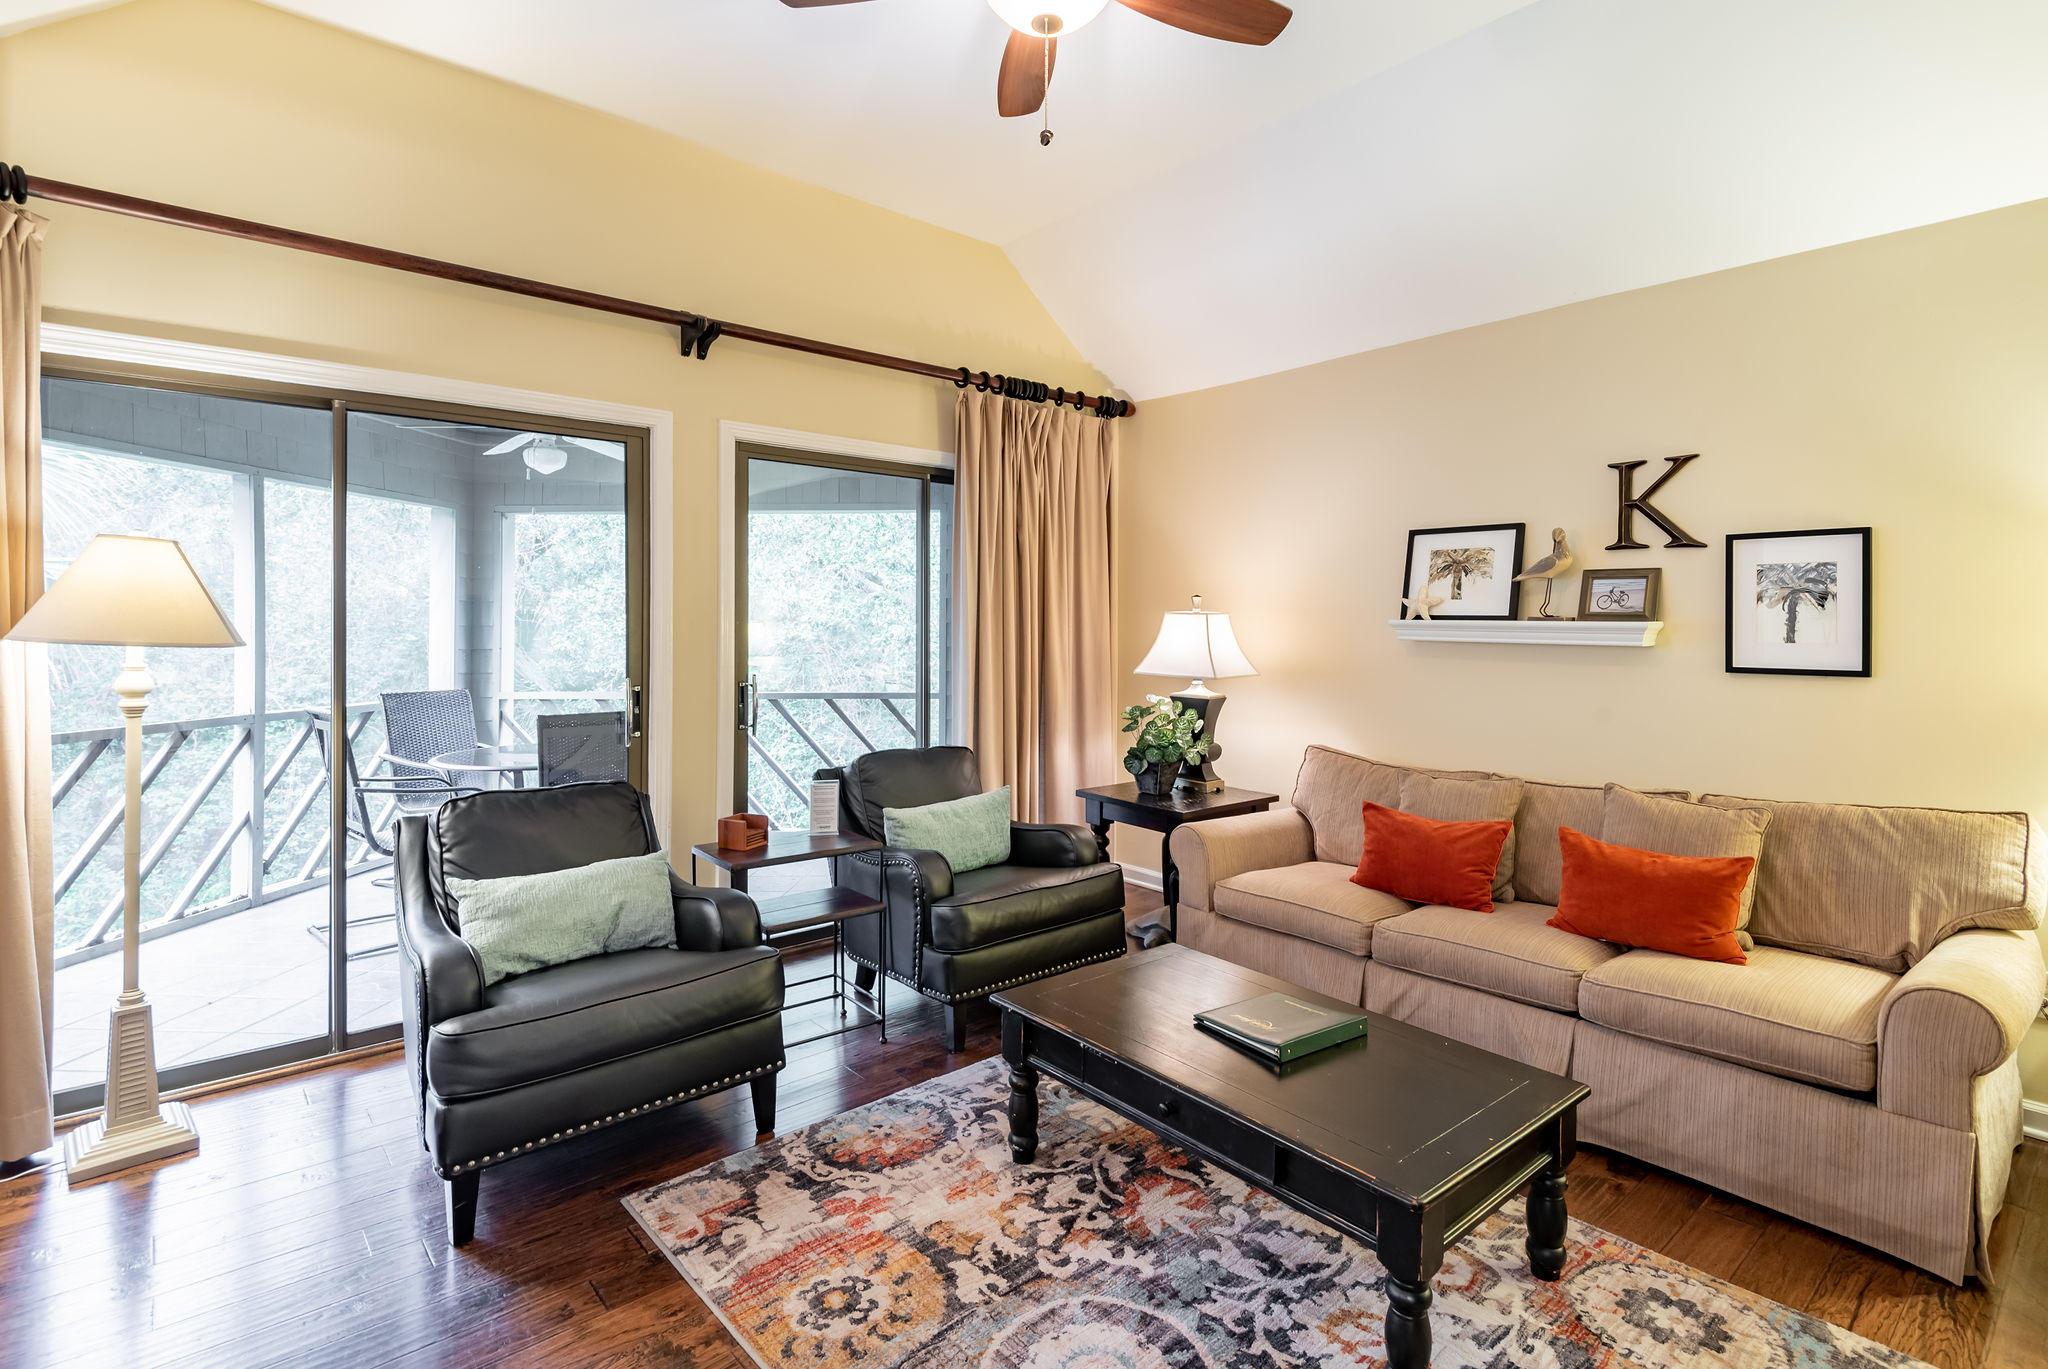 Kiawah Island Homes For Sale - 4660 Tennis Club, Kiawah Island, SC - 11